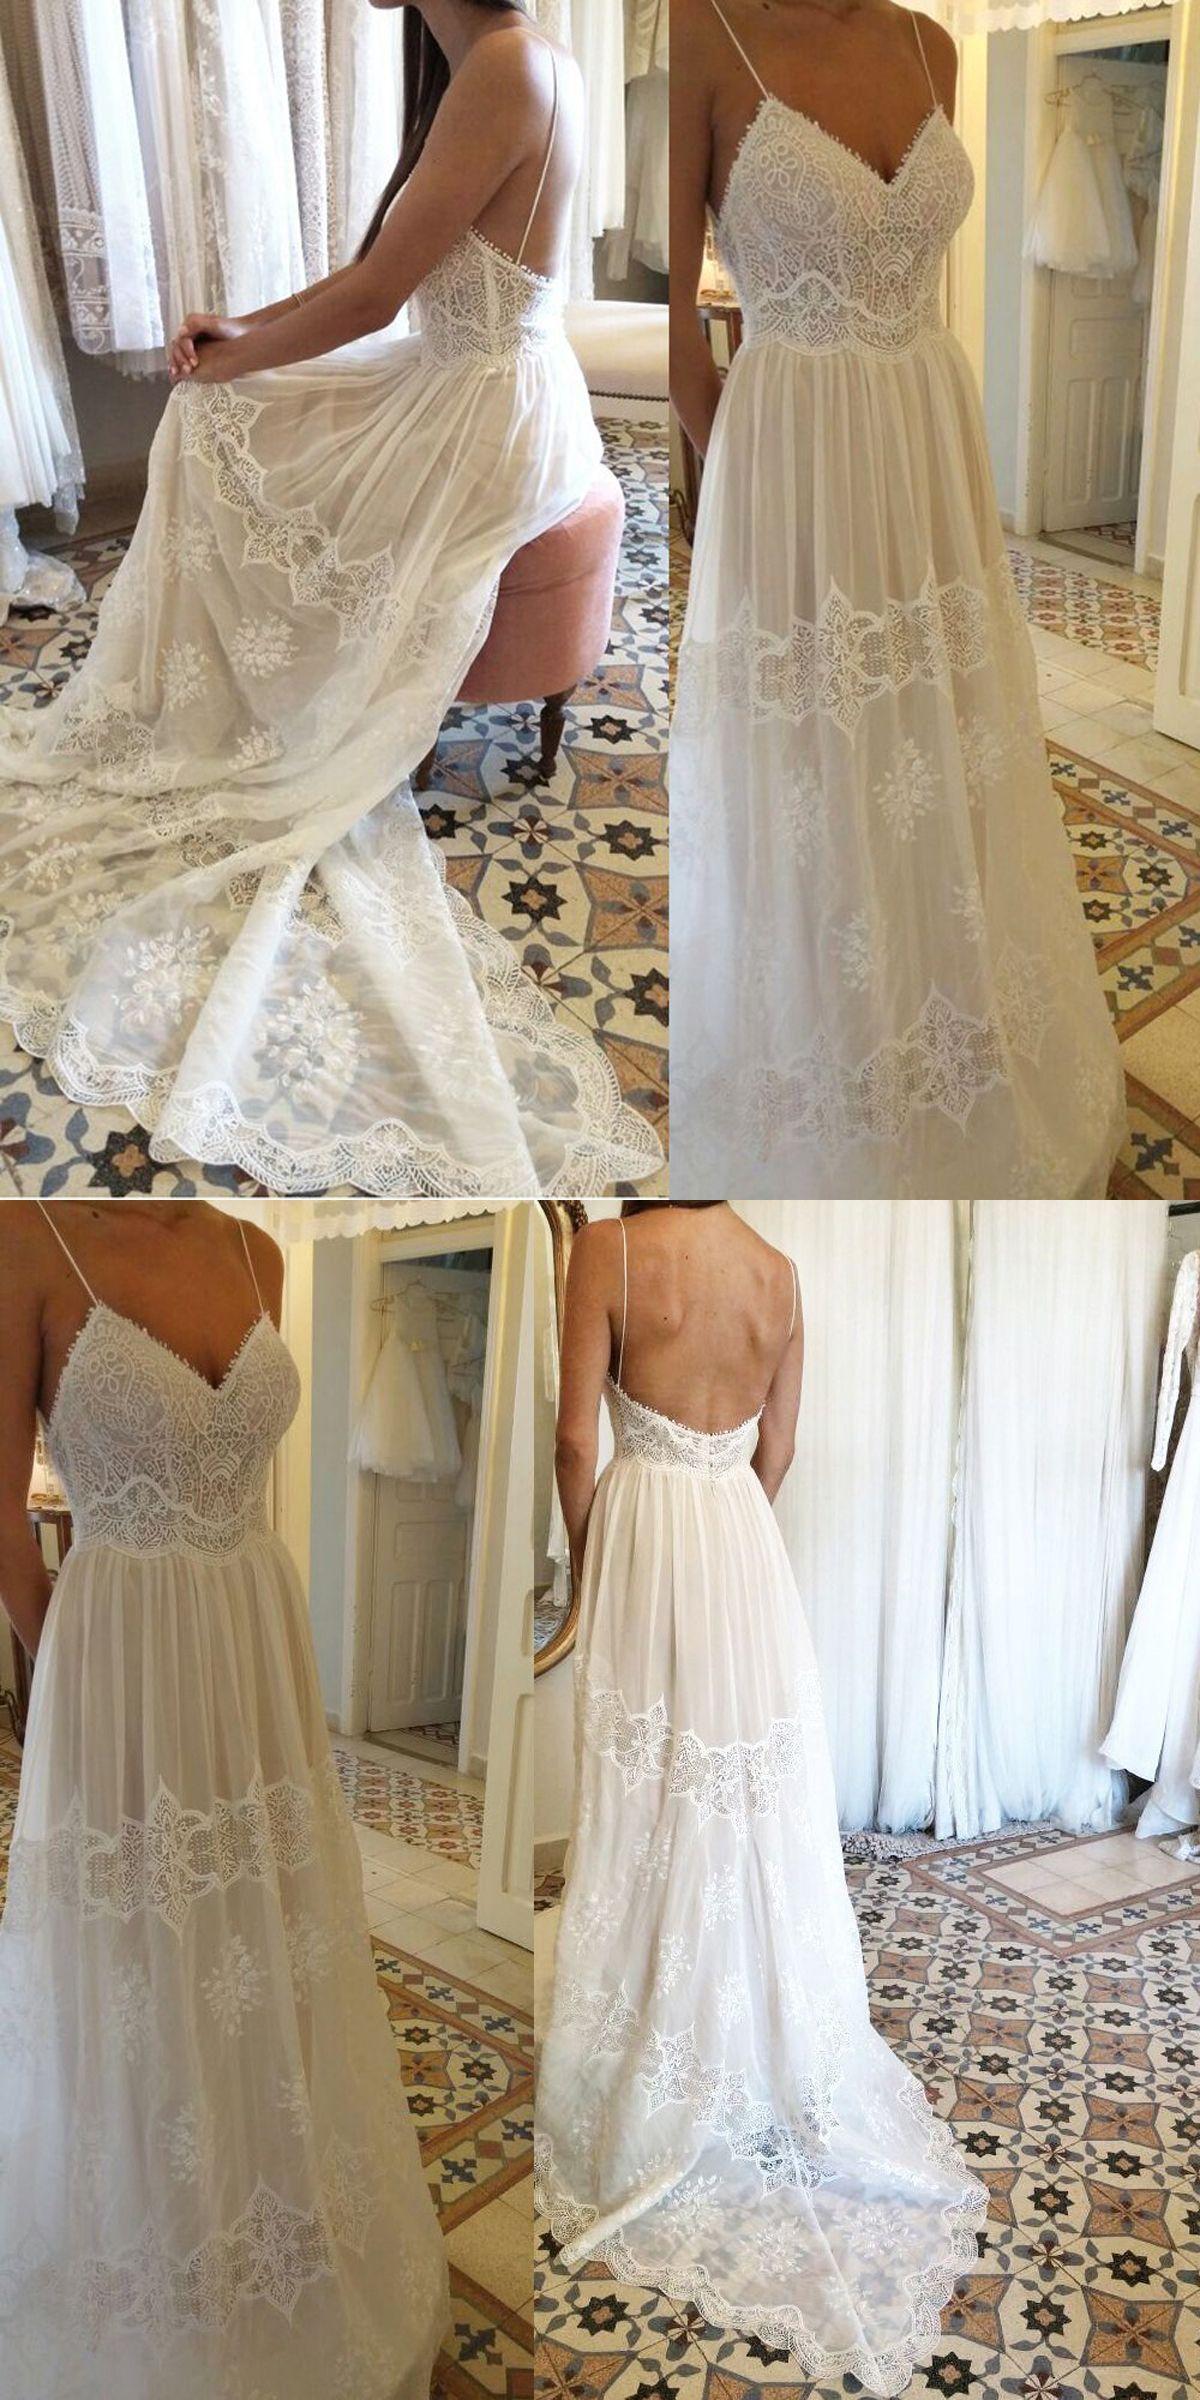 Lace off shoulder wedding dress august 2019 Blue Wedding Dress  wedpartyhairustuff  Pinterest  Spaghetti